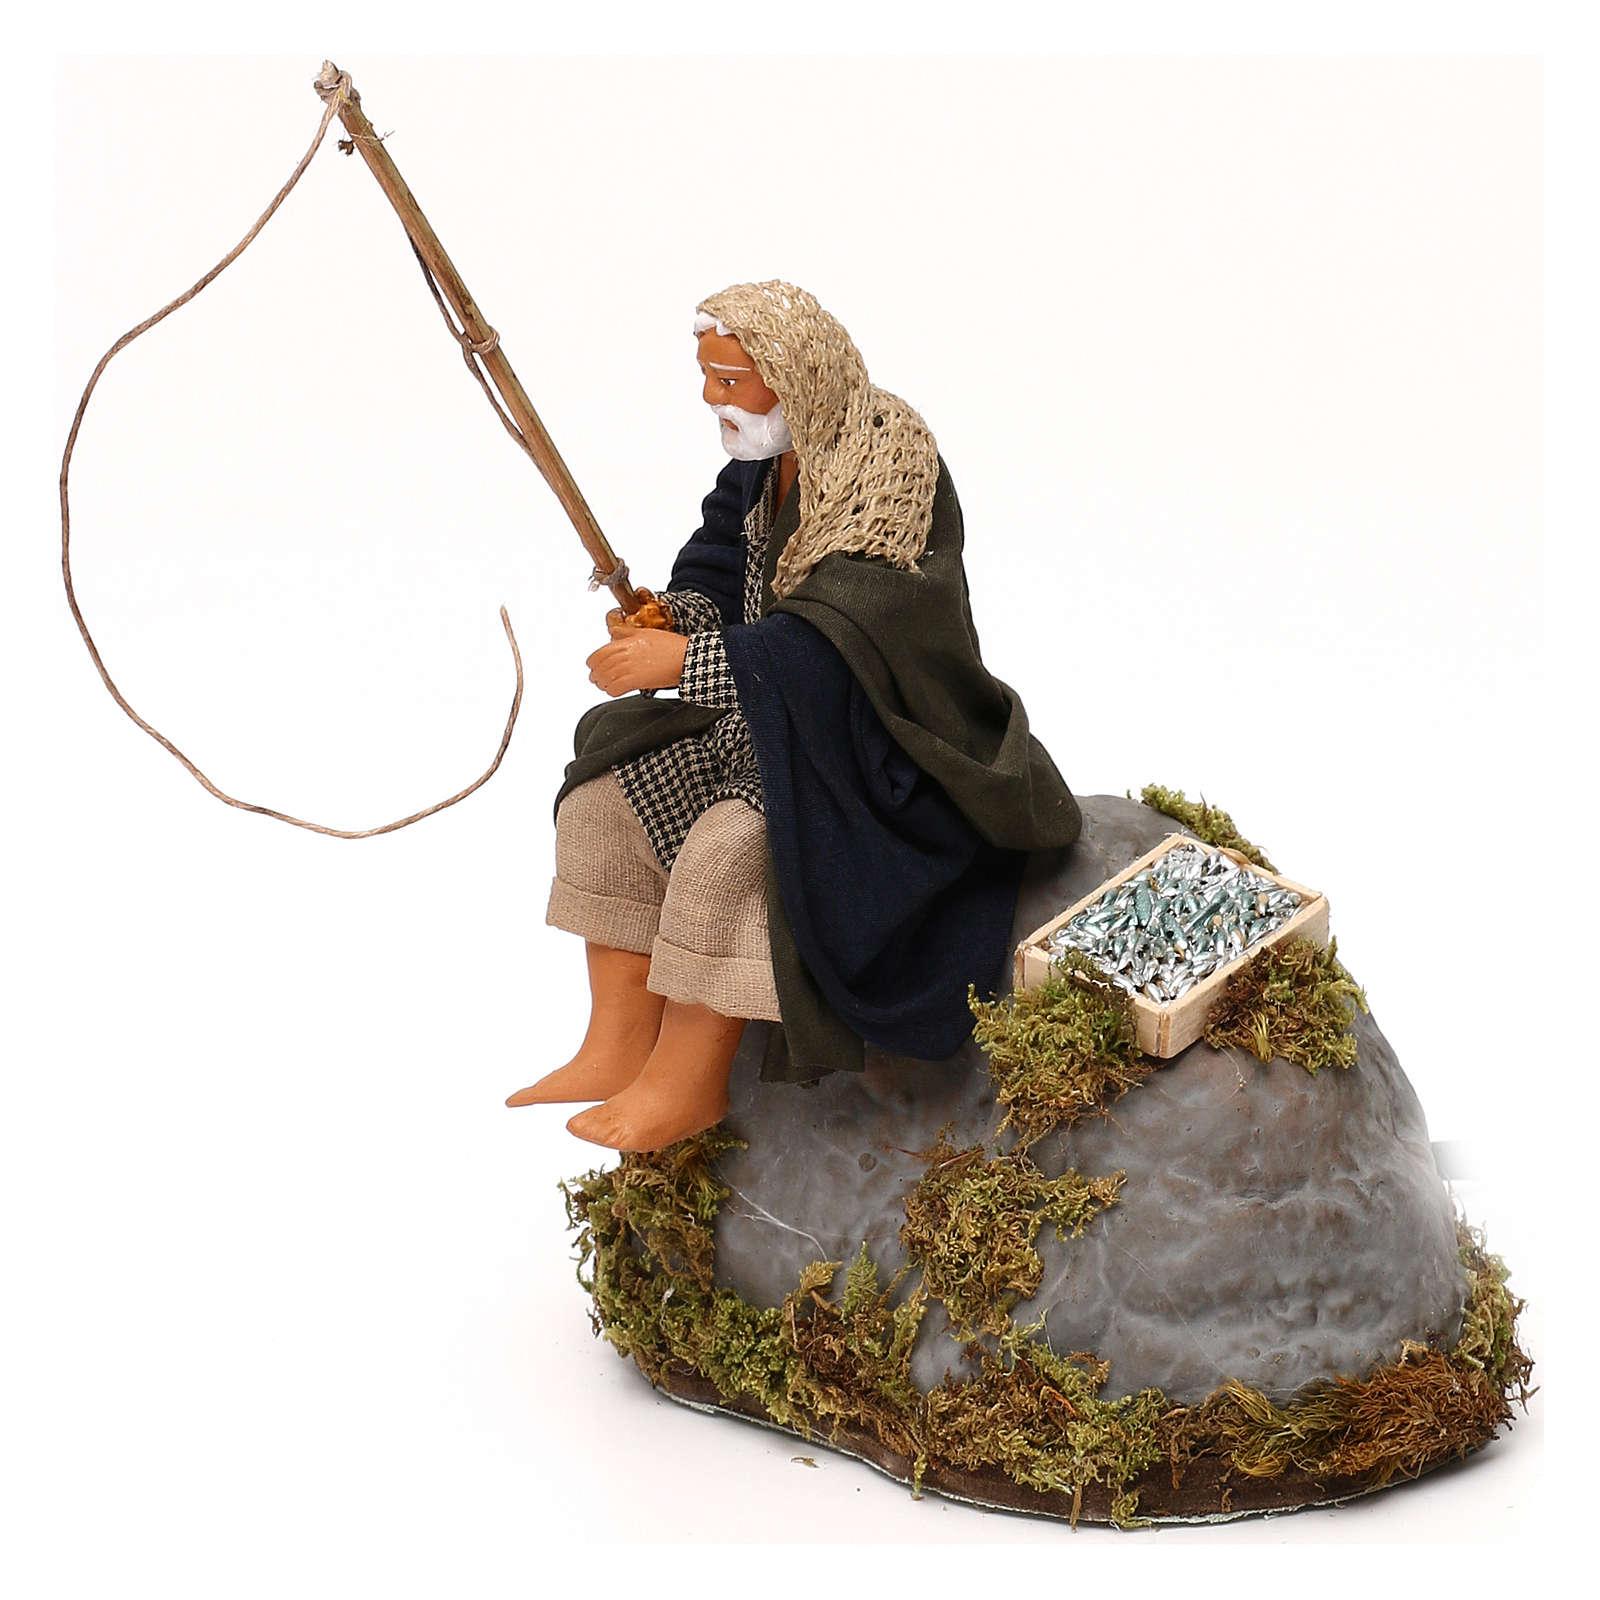 Man fishing from rock a 12cm Neapolitan Nativity animated figurine 4